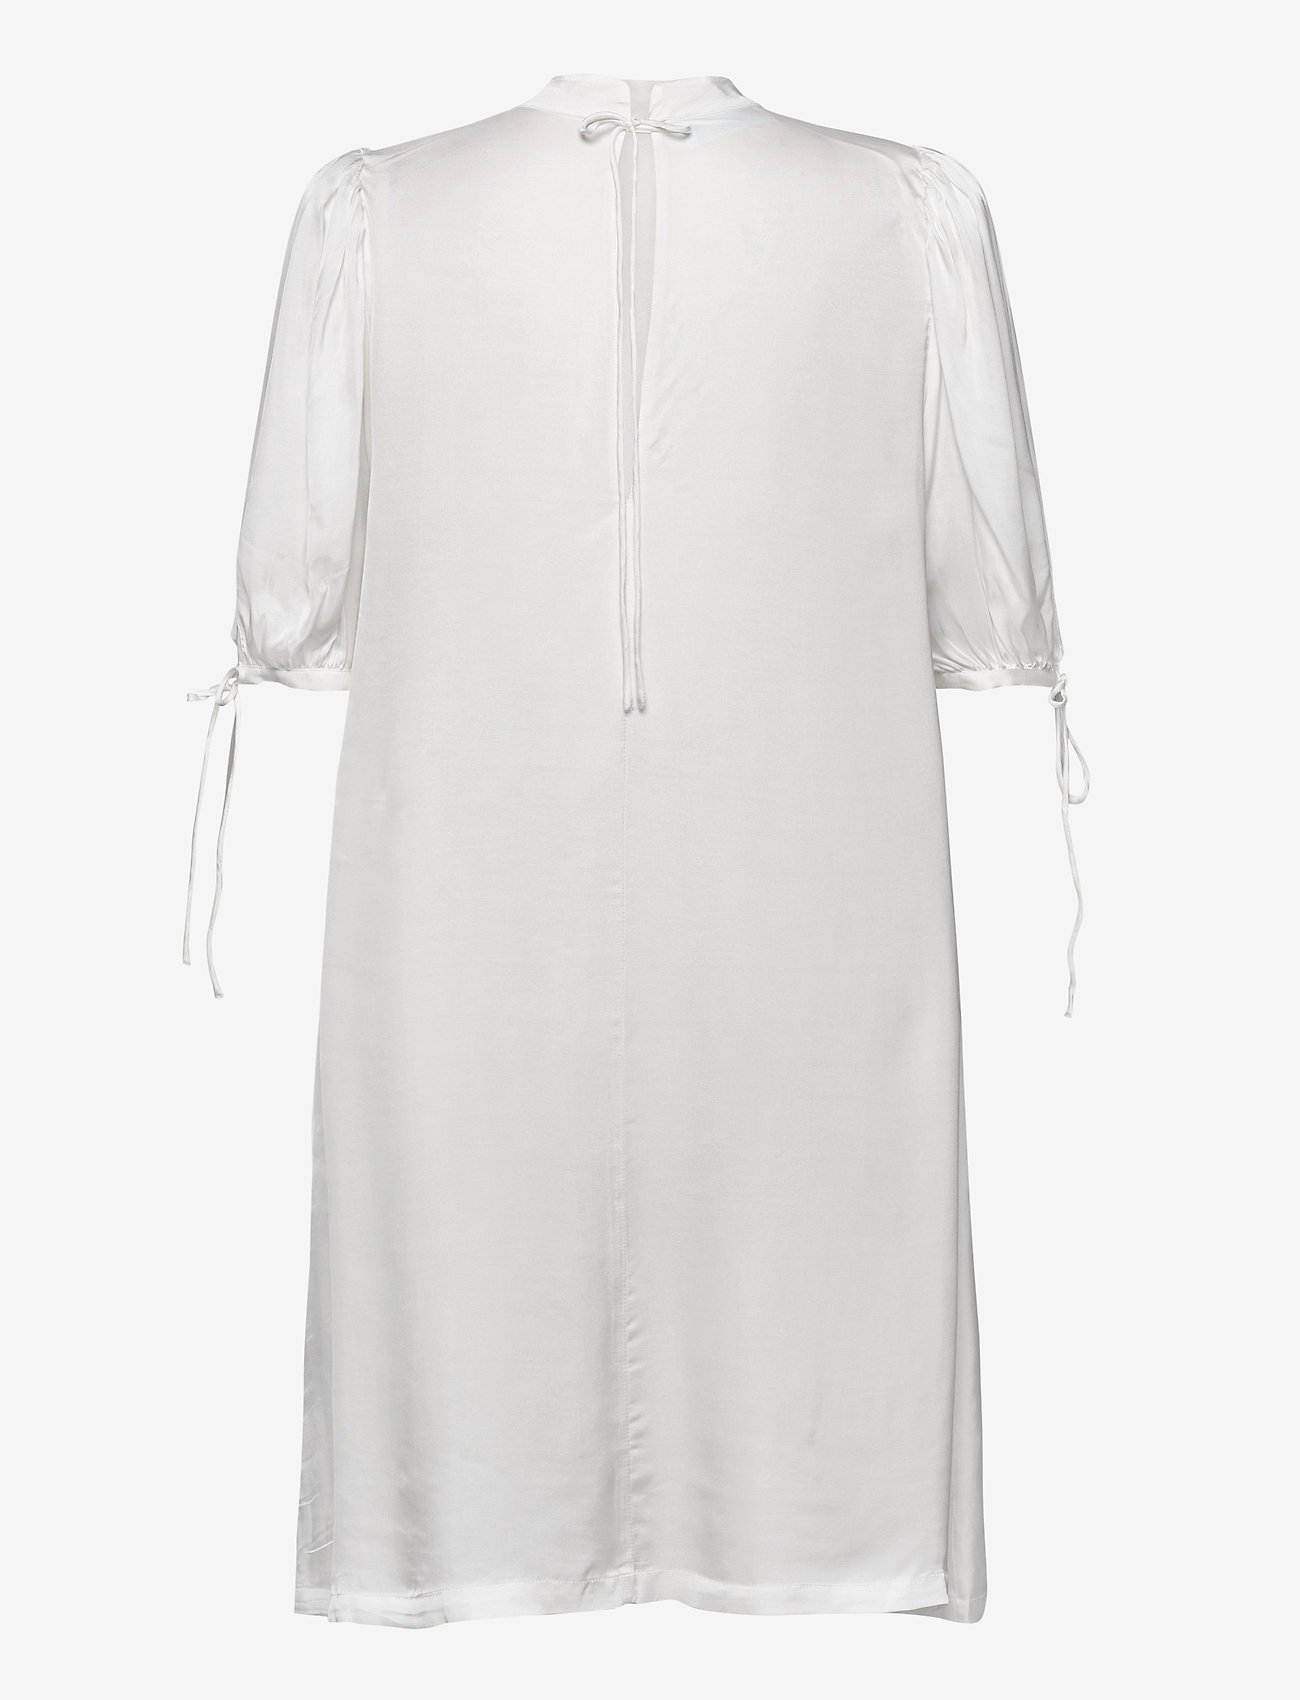 Mea Sleeve Dress (Cream) (1715 kr) - DESIGNERS, REMIX